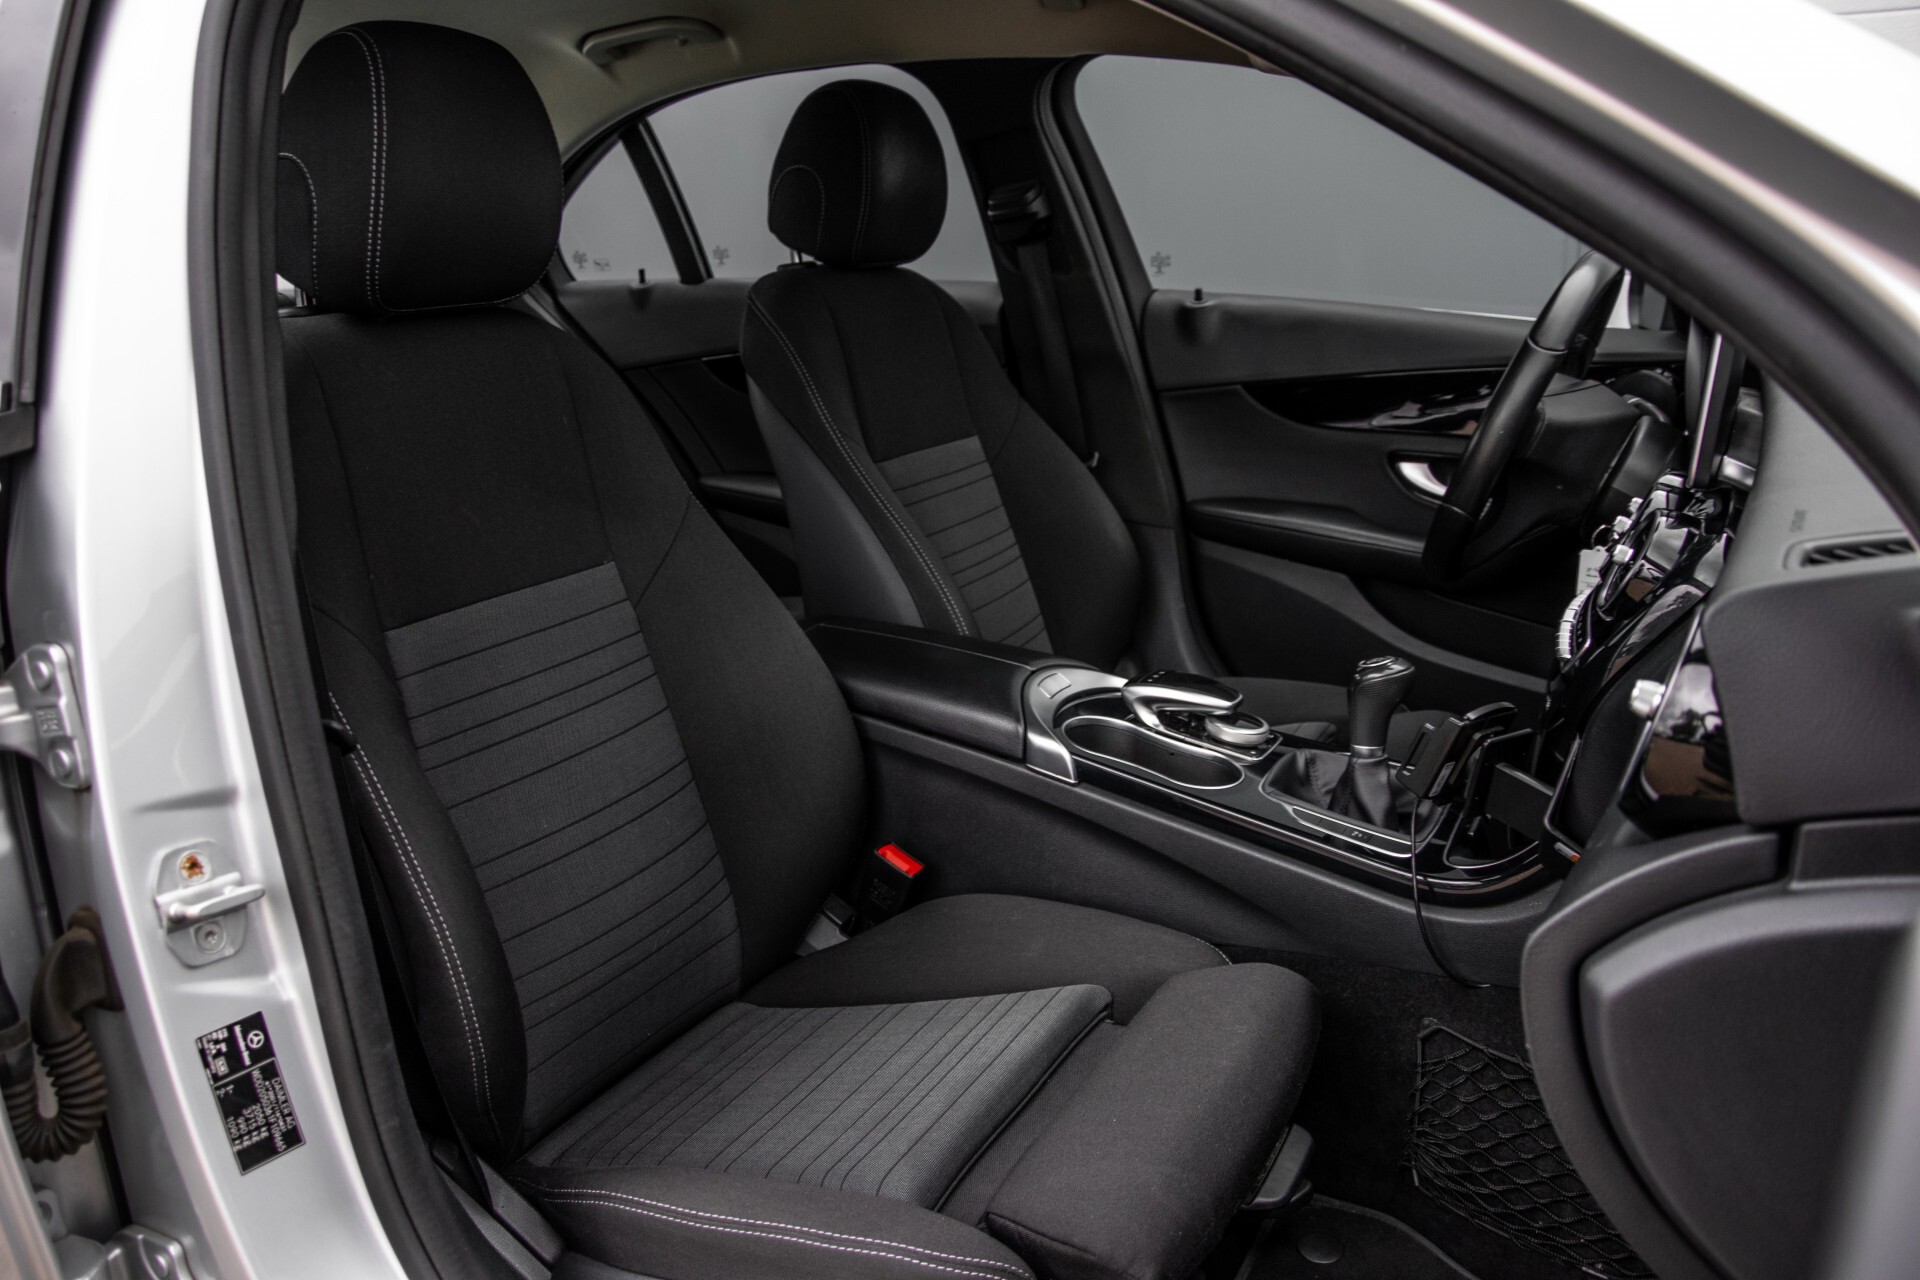 Mercedes-Benz C-Klasse 180 Bluetec Lease Edition Intelligent Light System/Cruise Control/Navi Foto 3